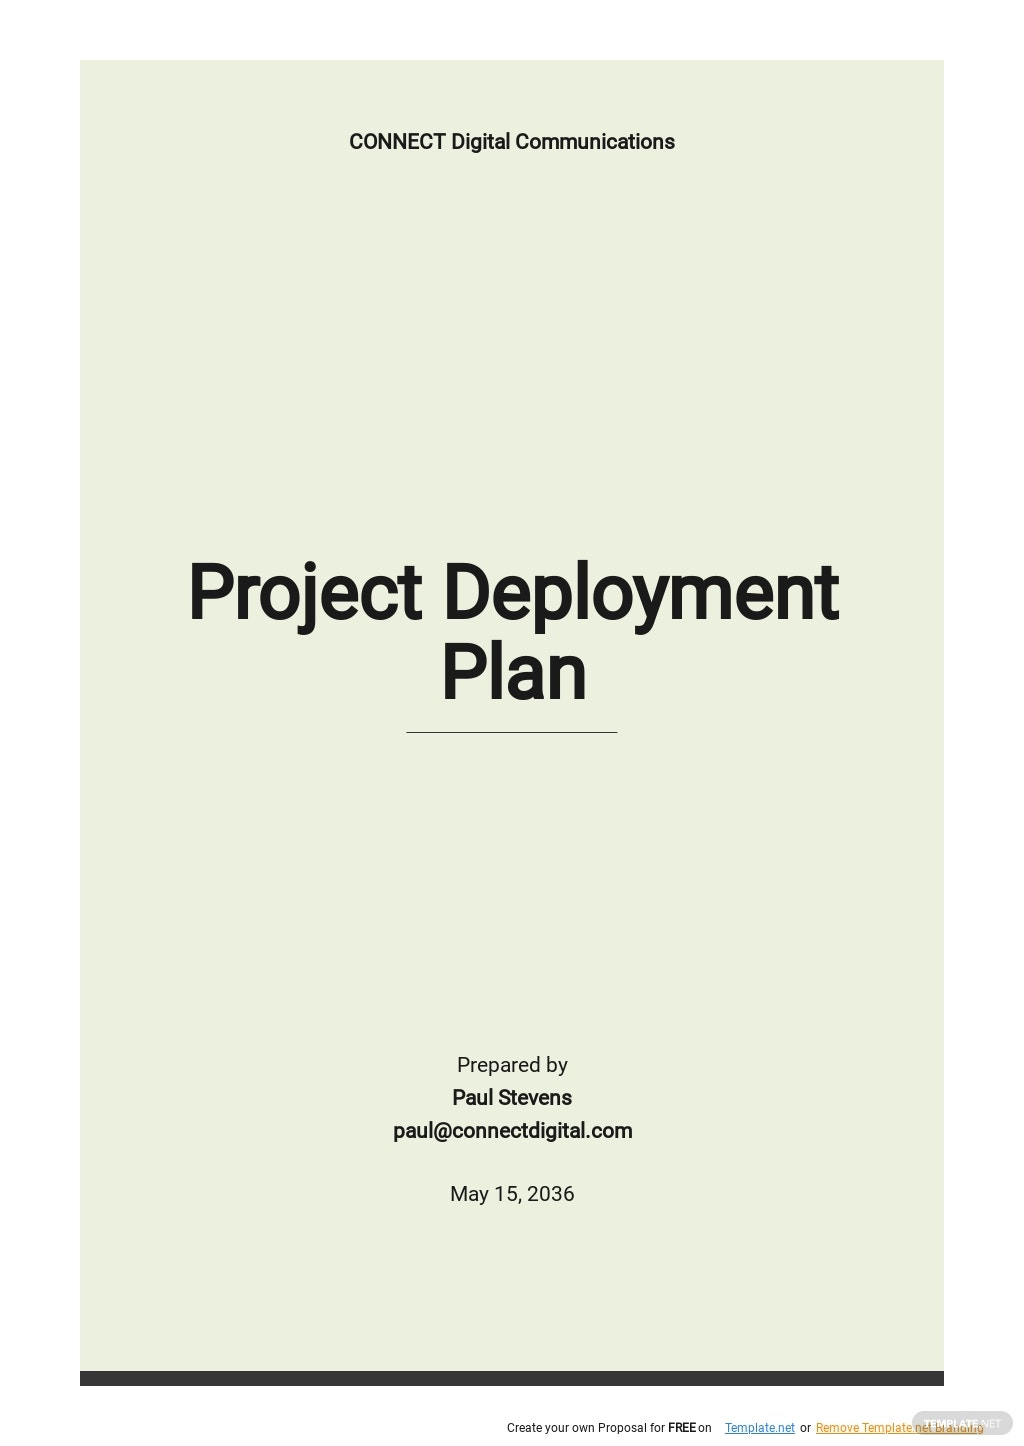 Project Deployment Plan Template.jpe